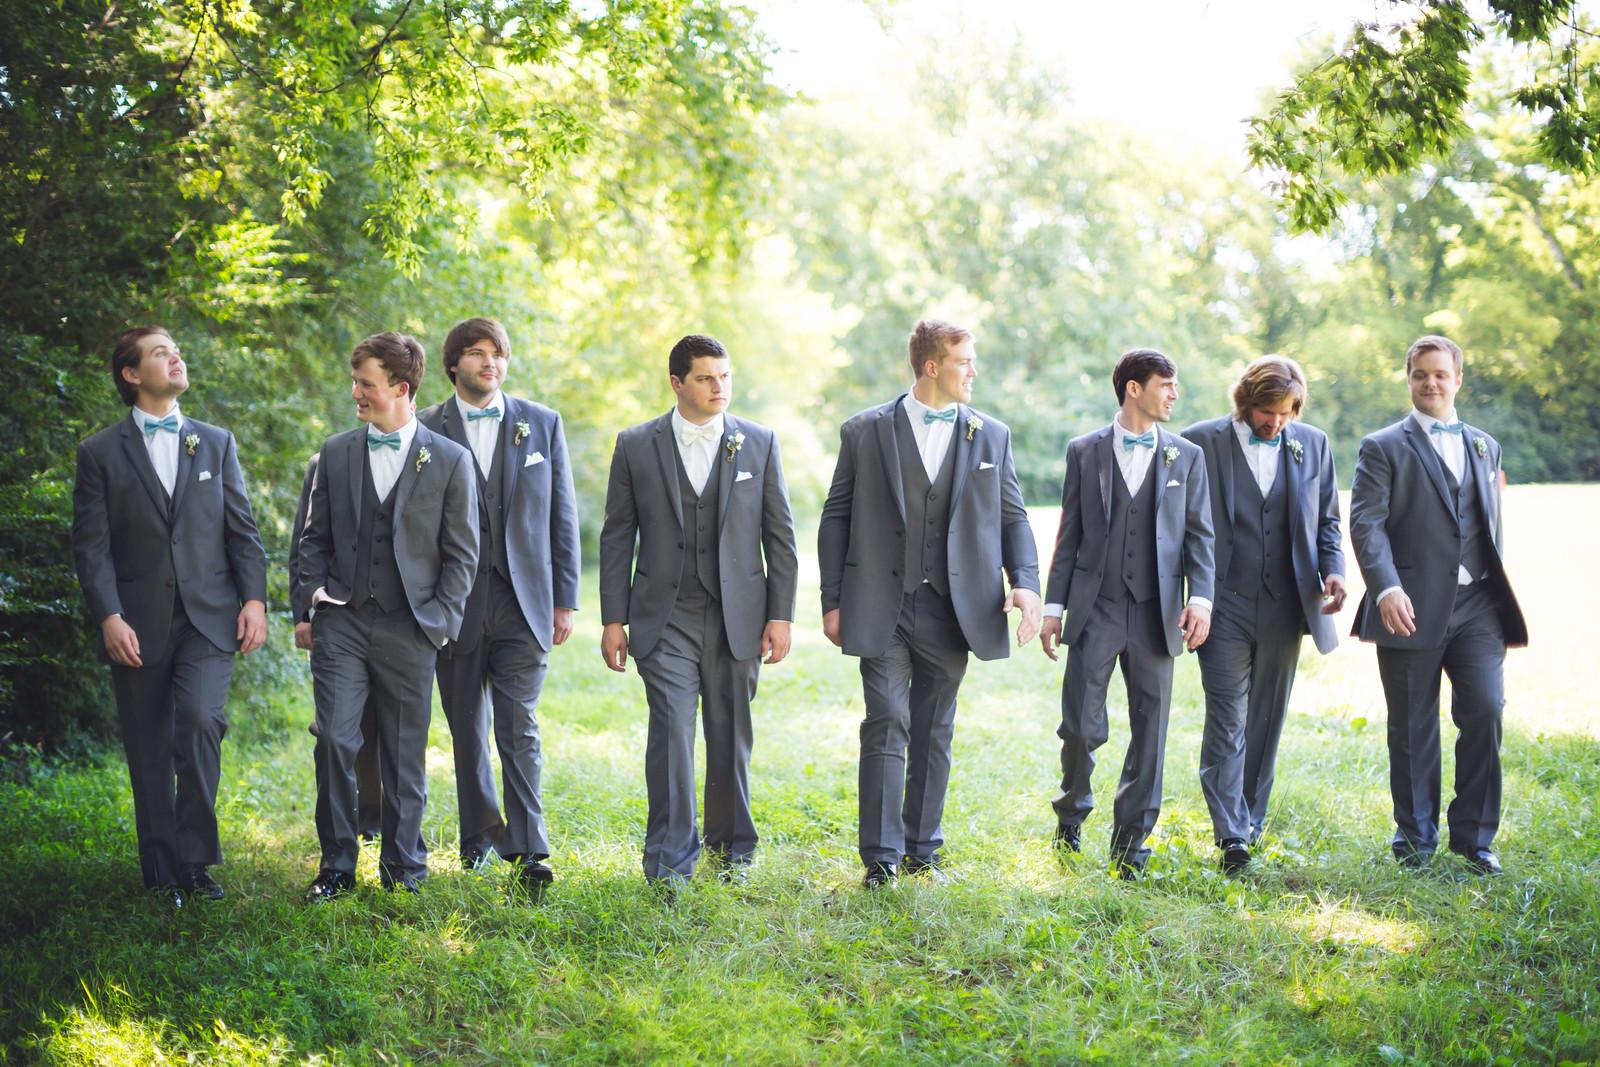 375_Harrison+Merritt_Wedding-X3.jpg